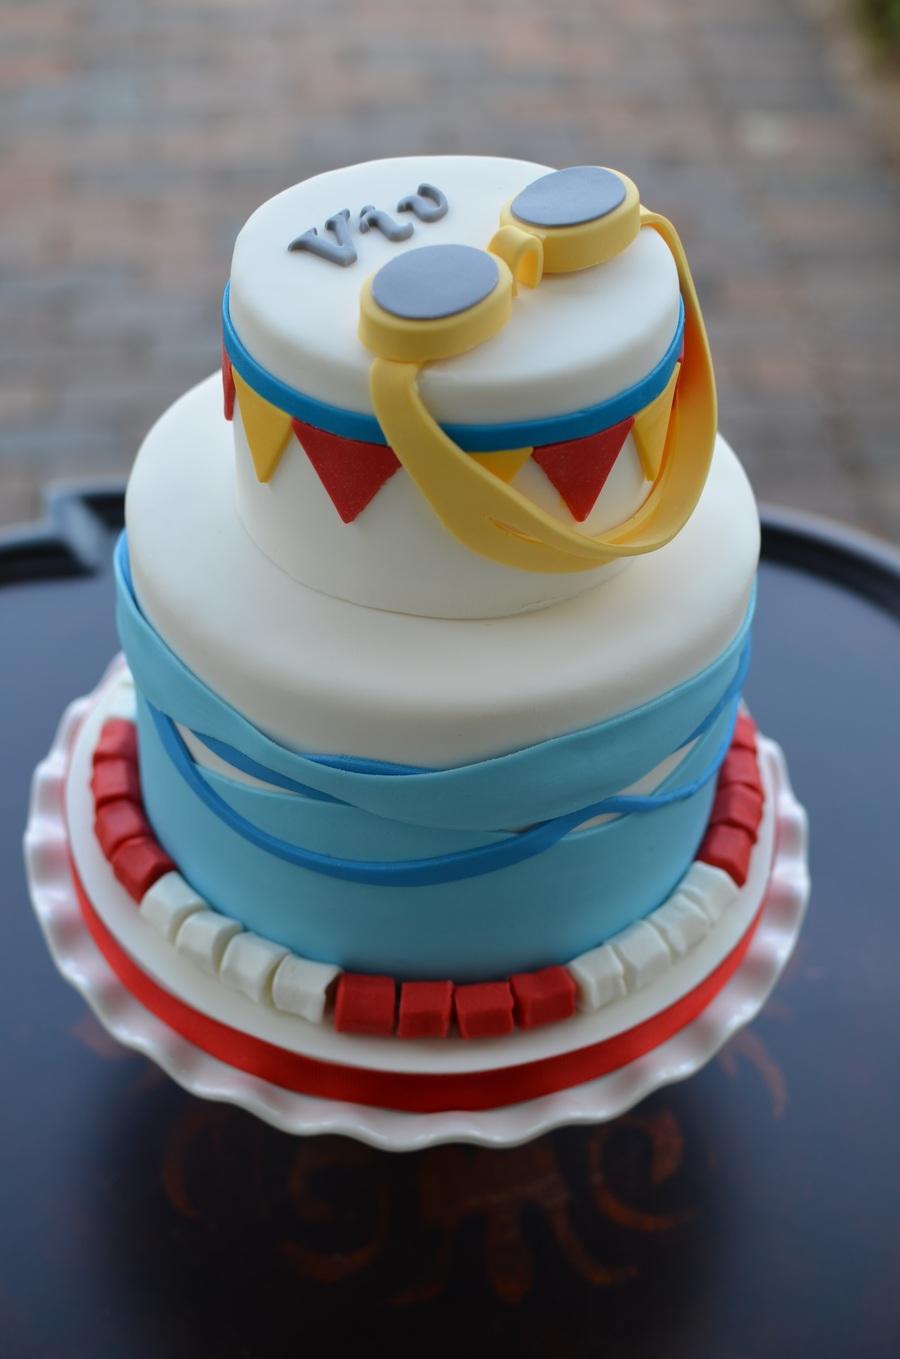 Swim themed birthday cake - Swimming pool birthday cake pictures ...